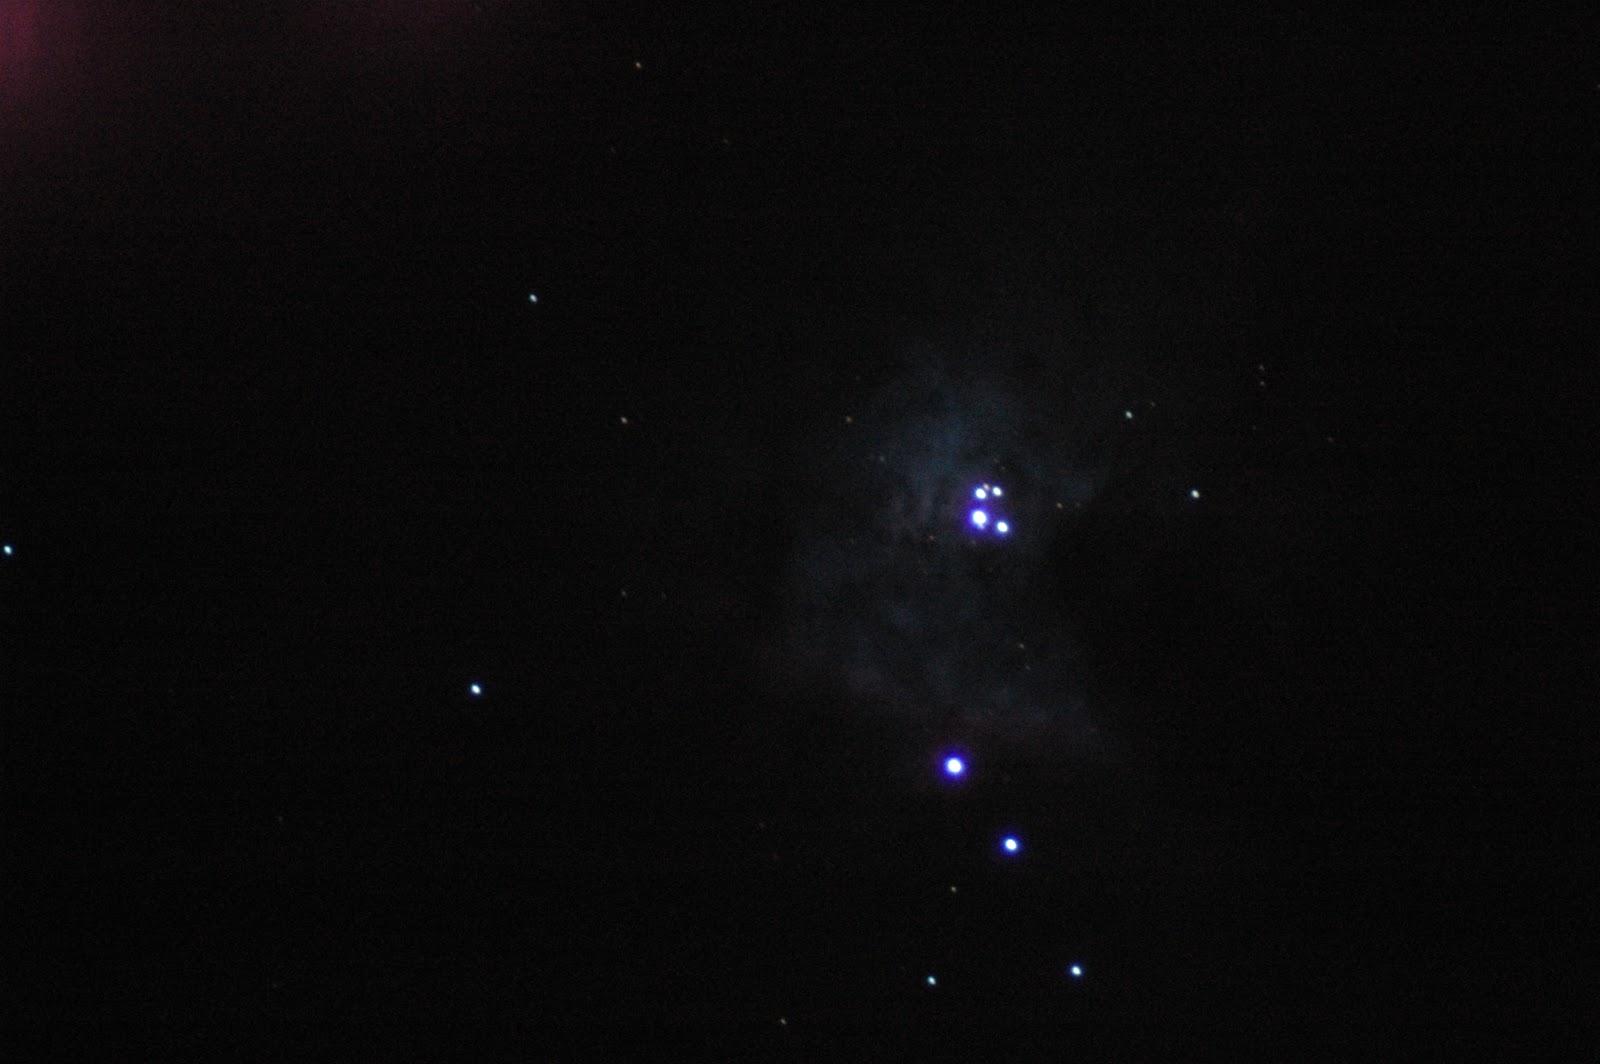 orion nebula through binoculars - photo #47